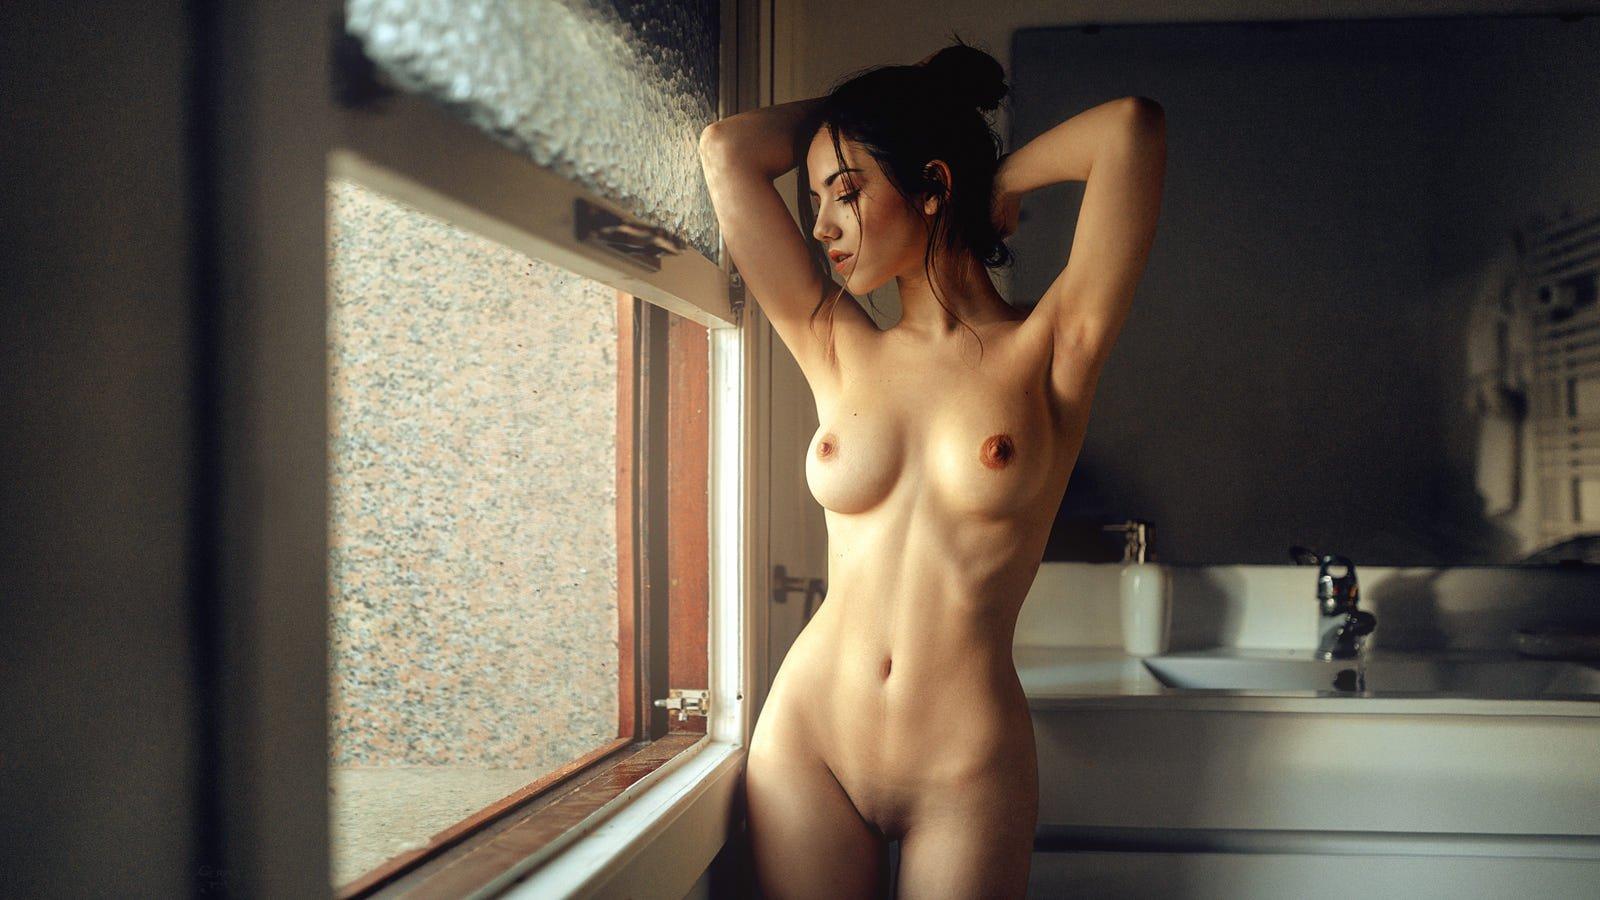 delaia gonzalez nude sexy photos thefappening